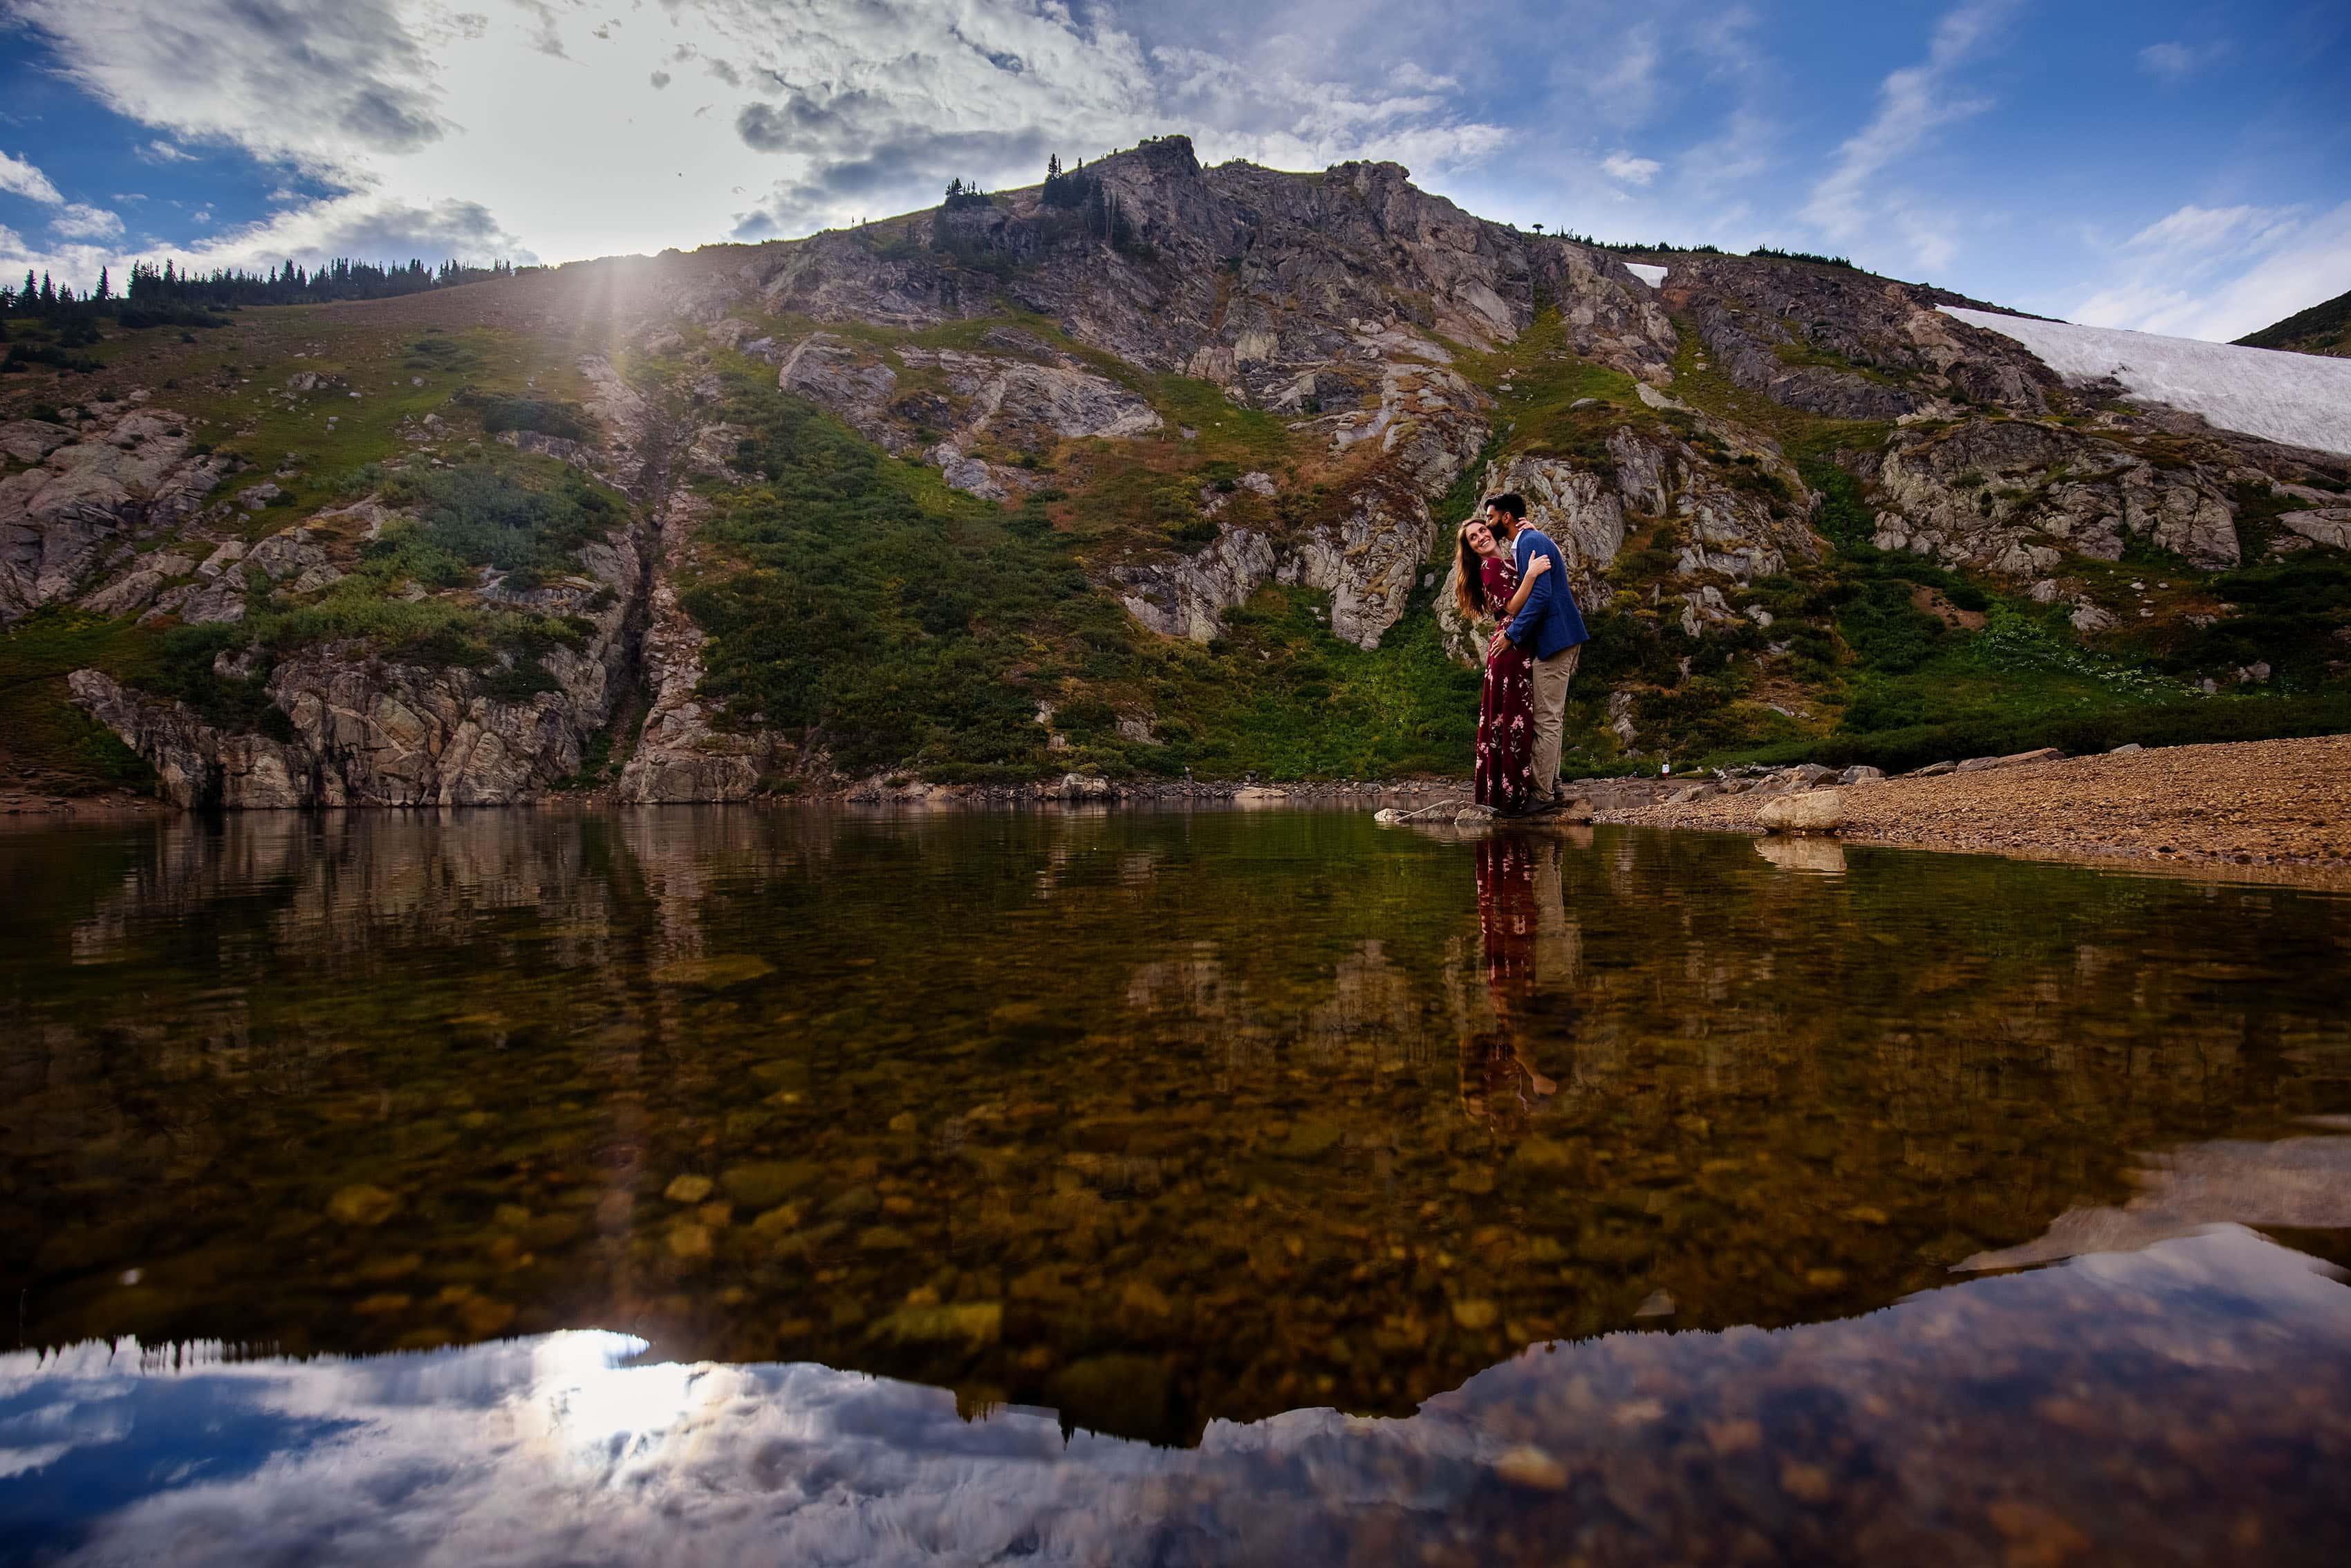 Colorado Mountain Lake Engagement | Kara & Moypa